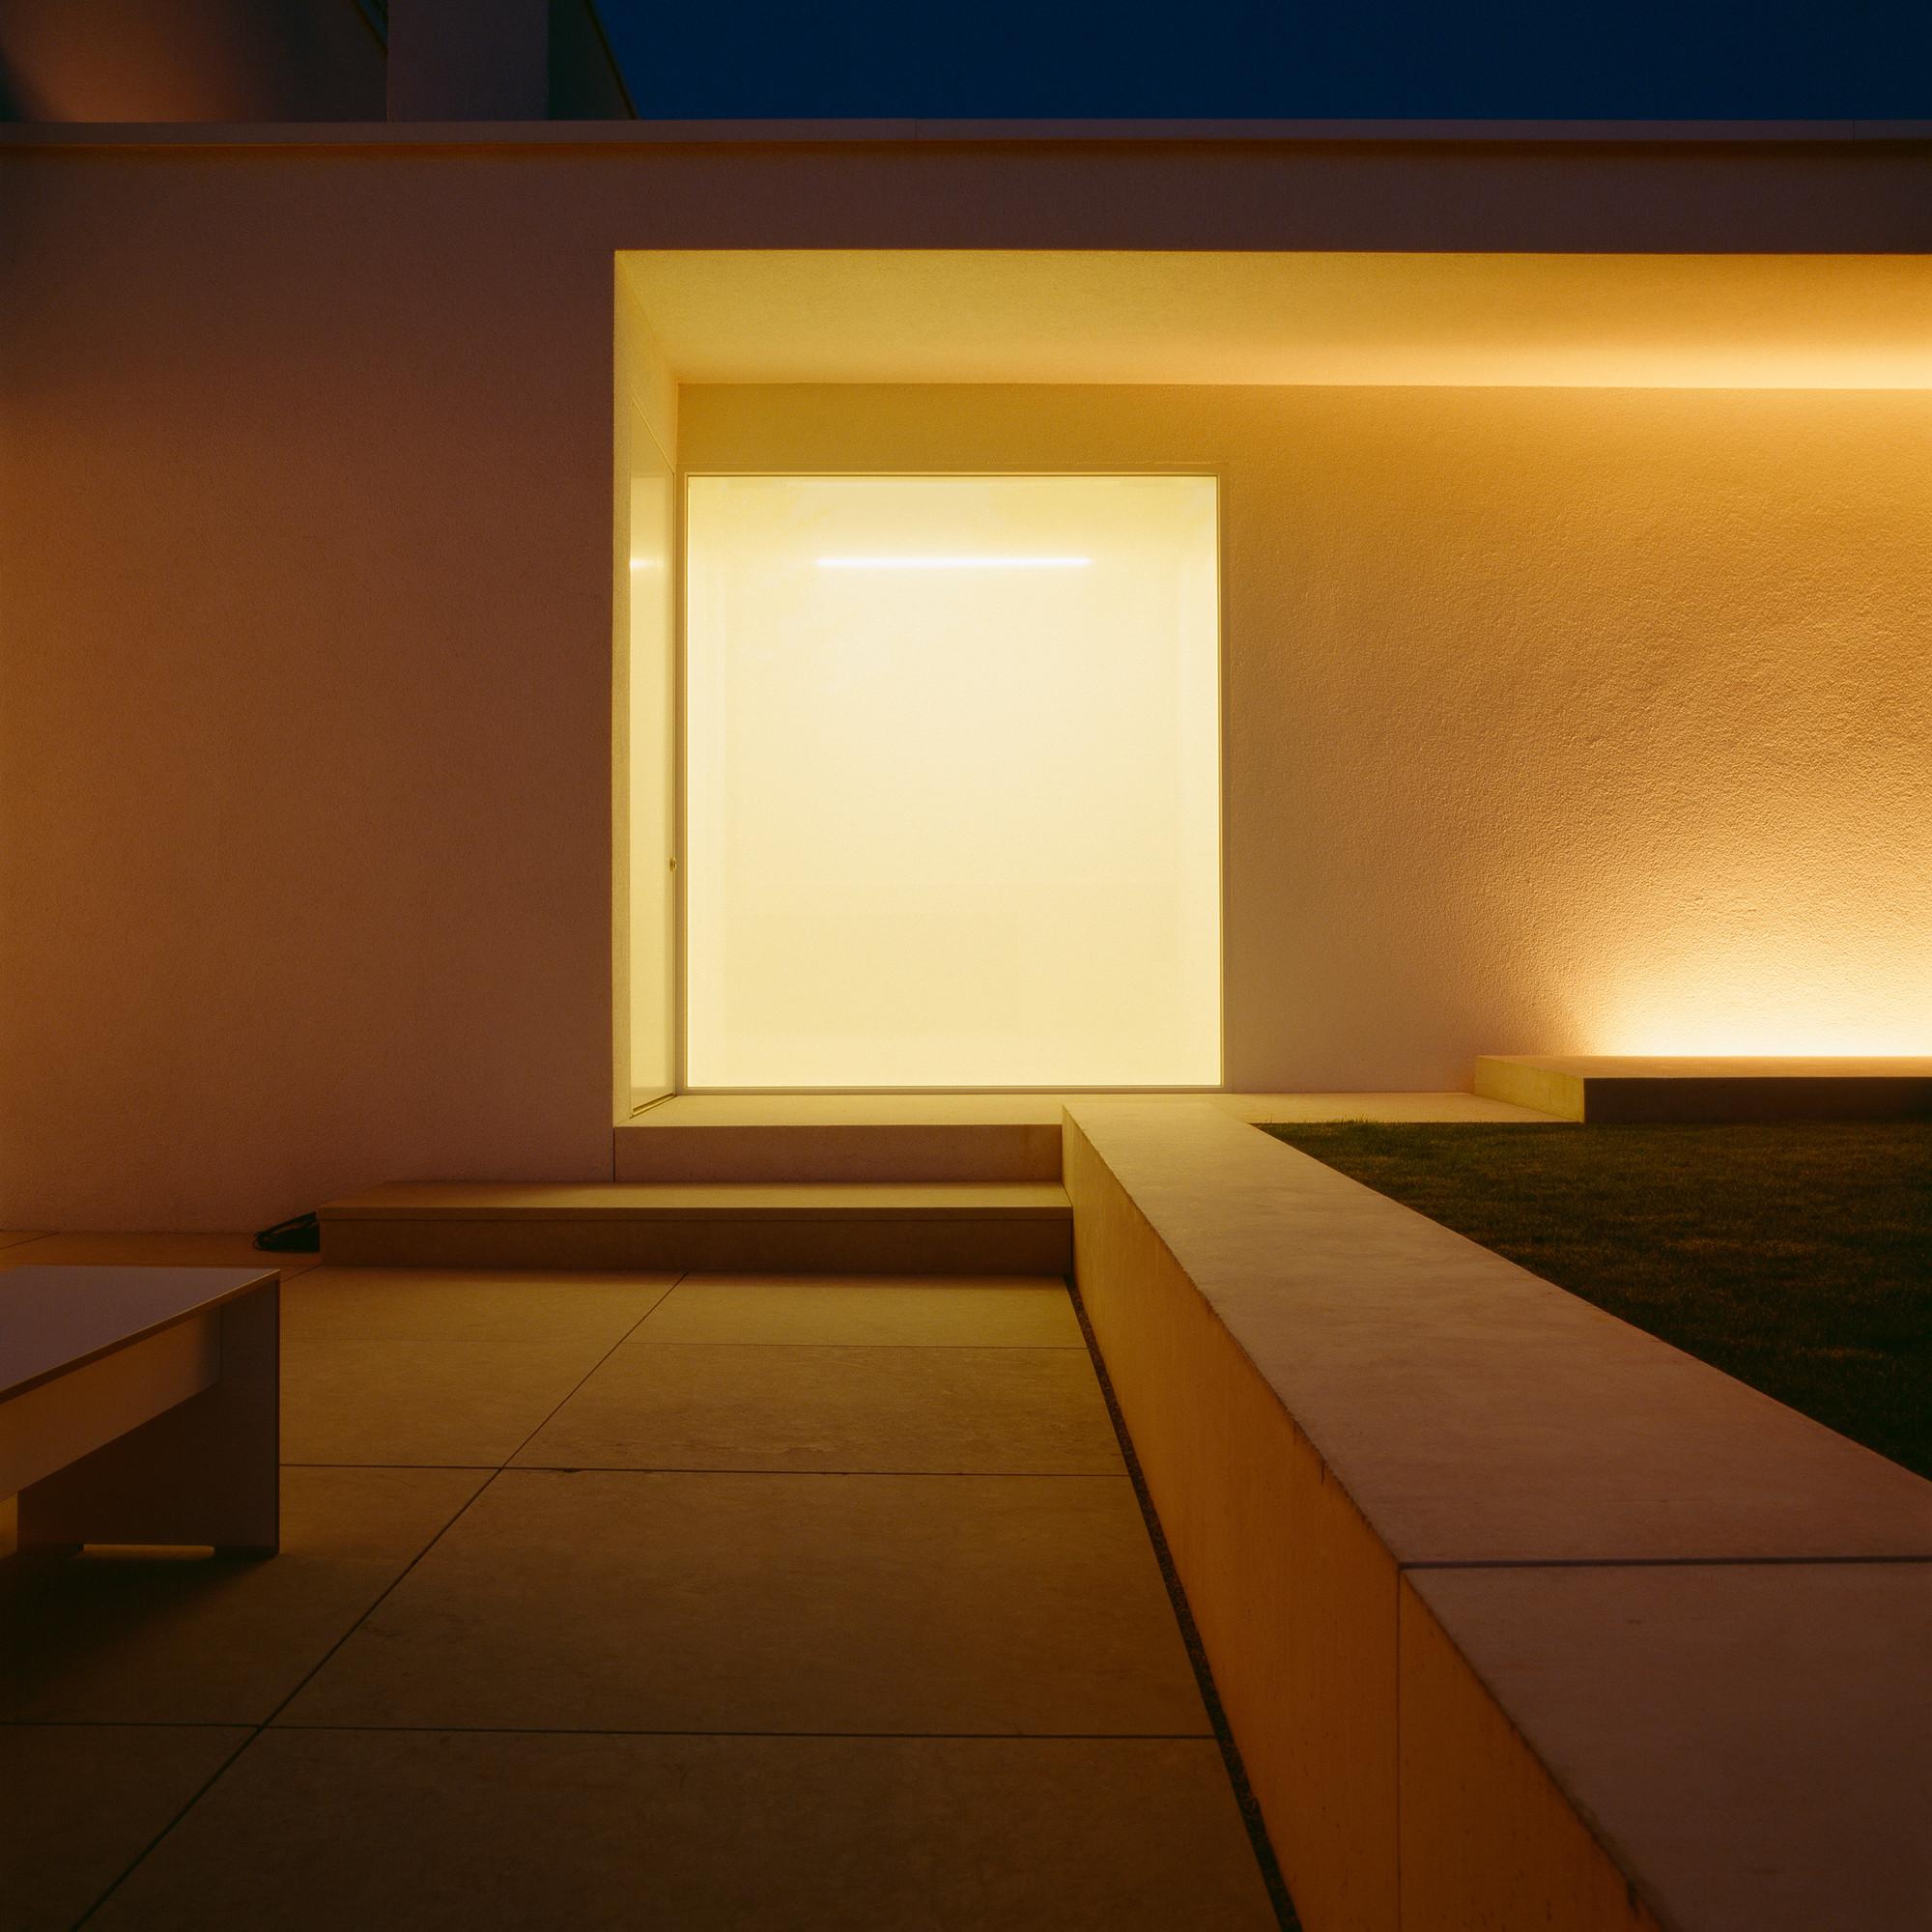 Galeria de casa p philipp architekten 24 - Philipp architekten ...